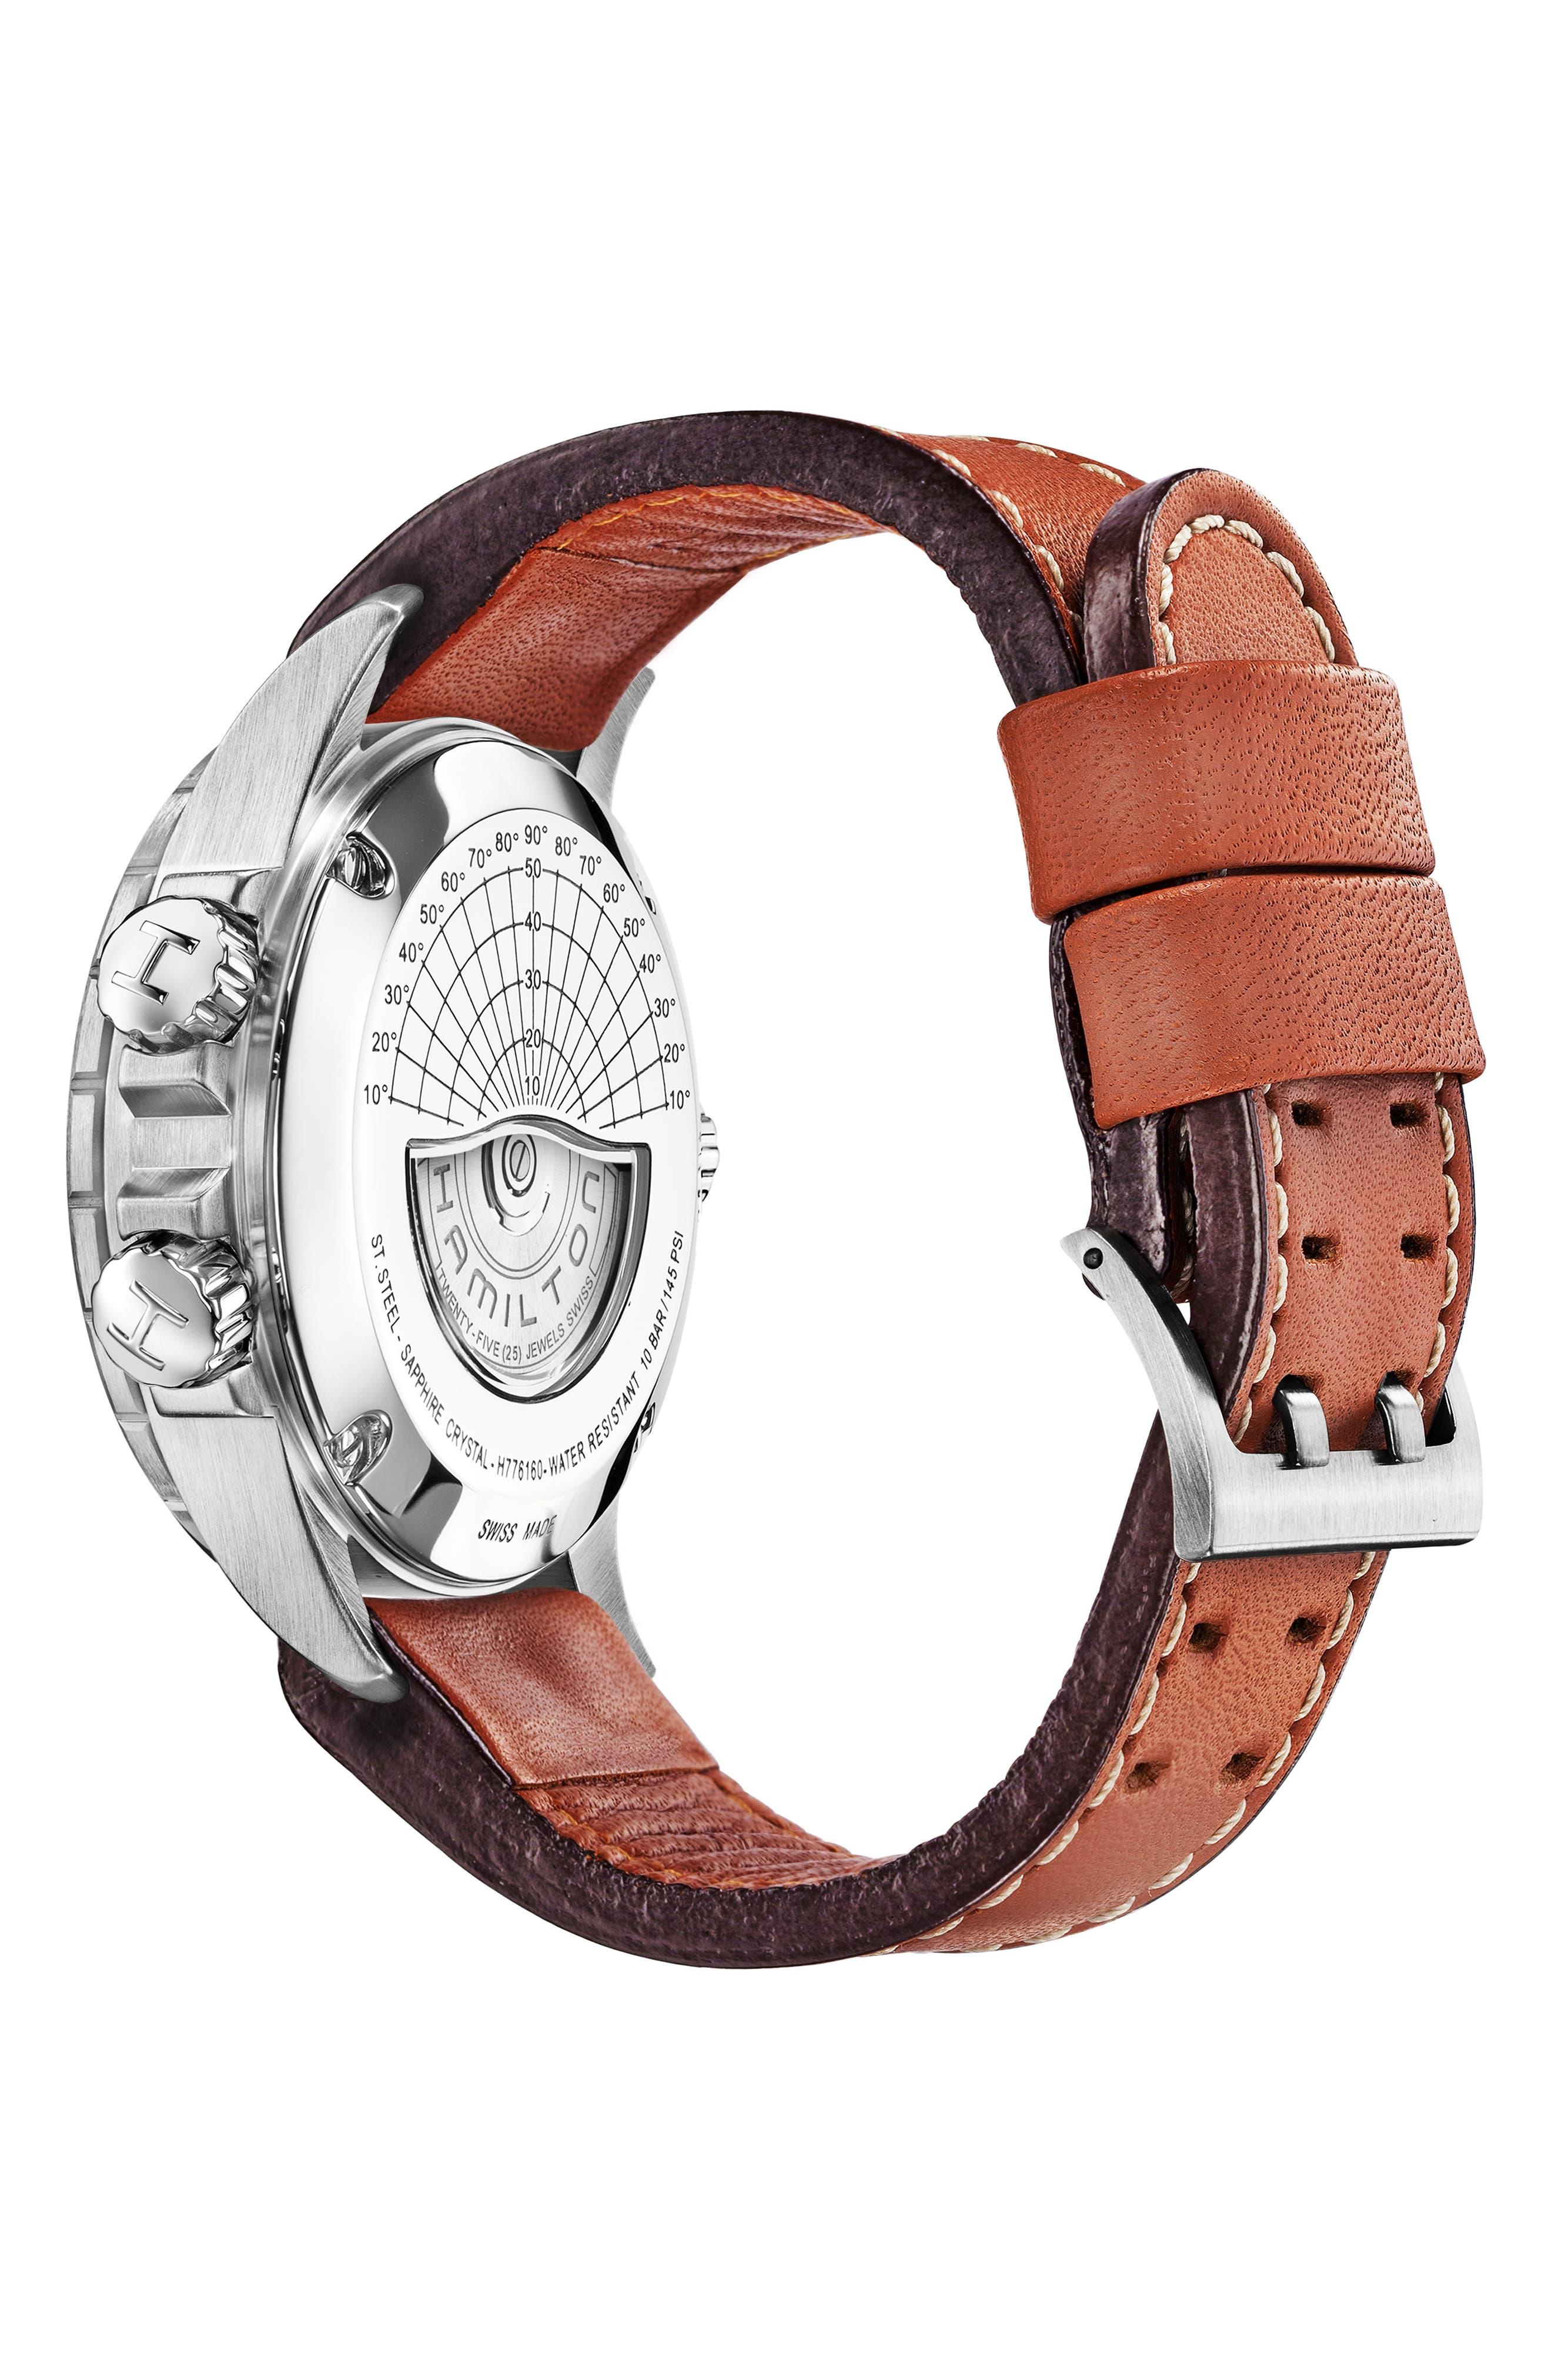 HAMILTON, Khaki Aviation X-Wind Automatic Chronograph Leather Strap Watch, 44mm, Alternate thumbnail 2, color, BROWN/ BLACK/ SILVER